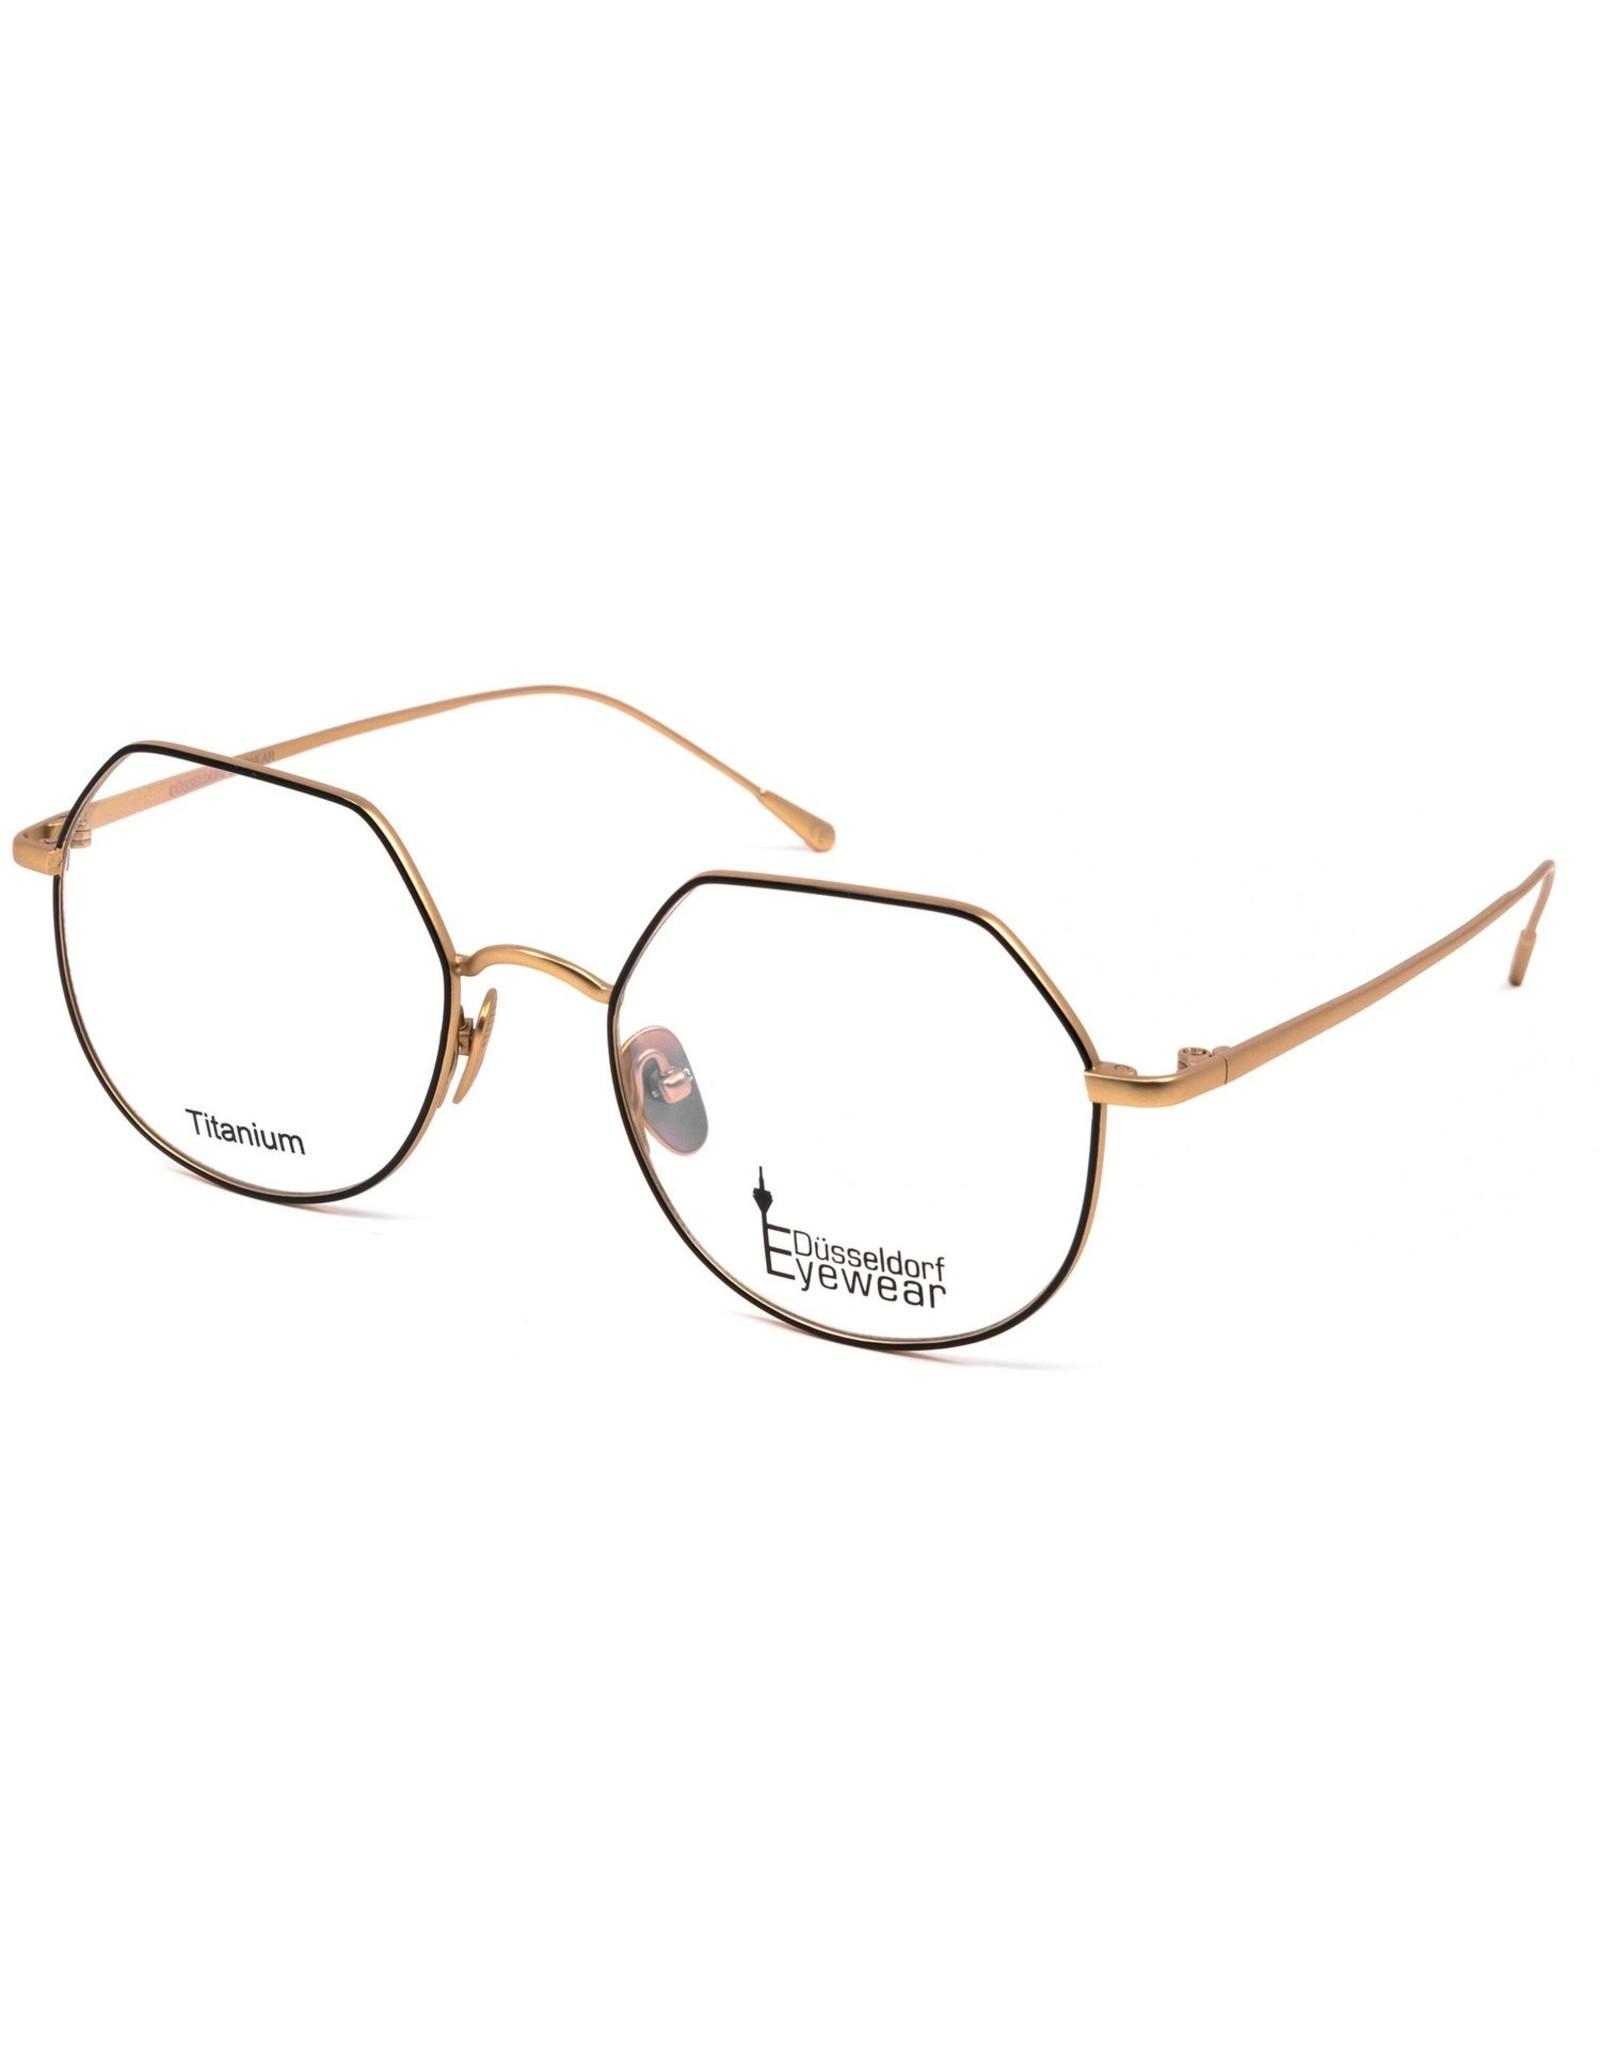 Dusselorf Eyewear Dusseldorf Eyewear Uni Ost chroom